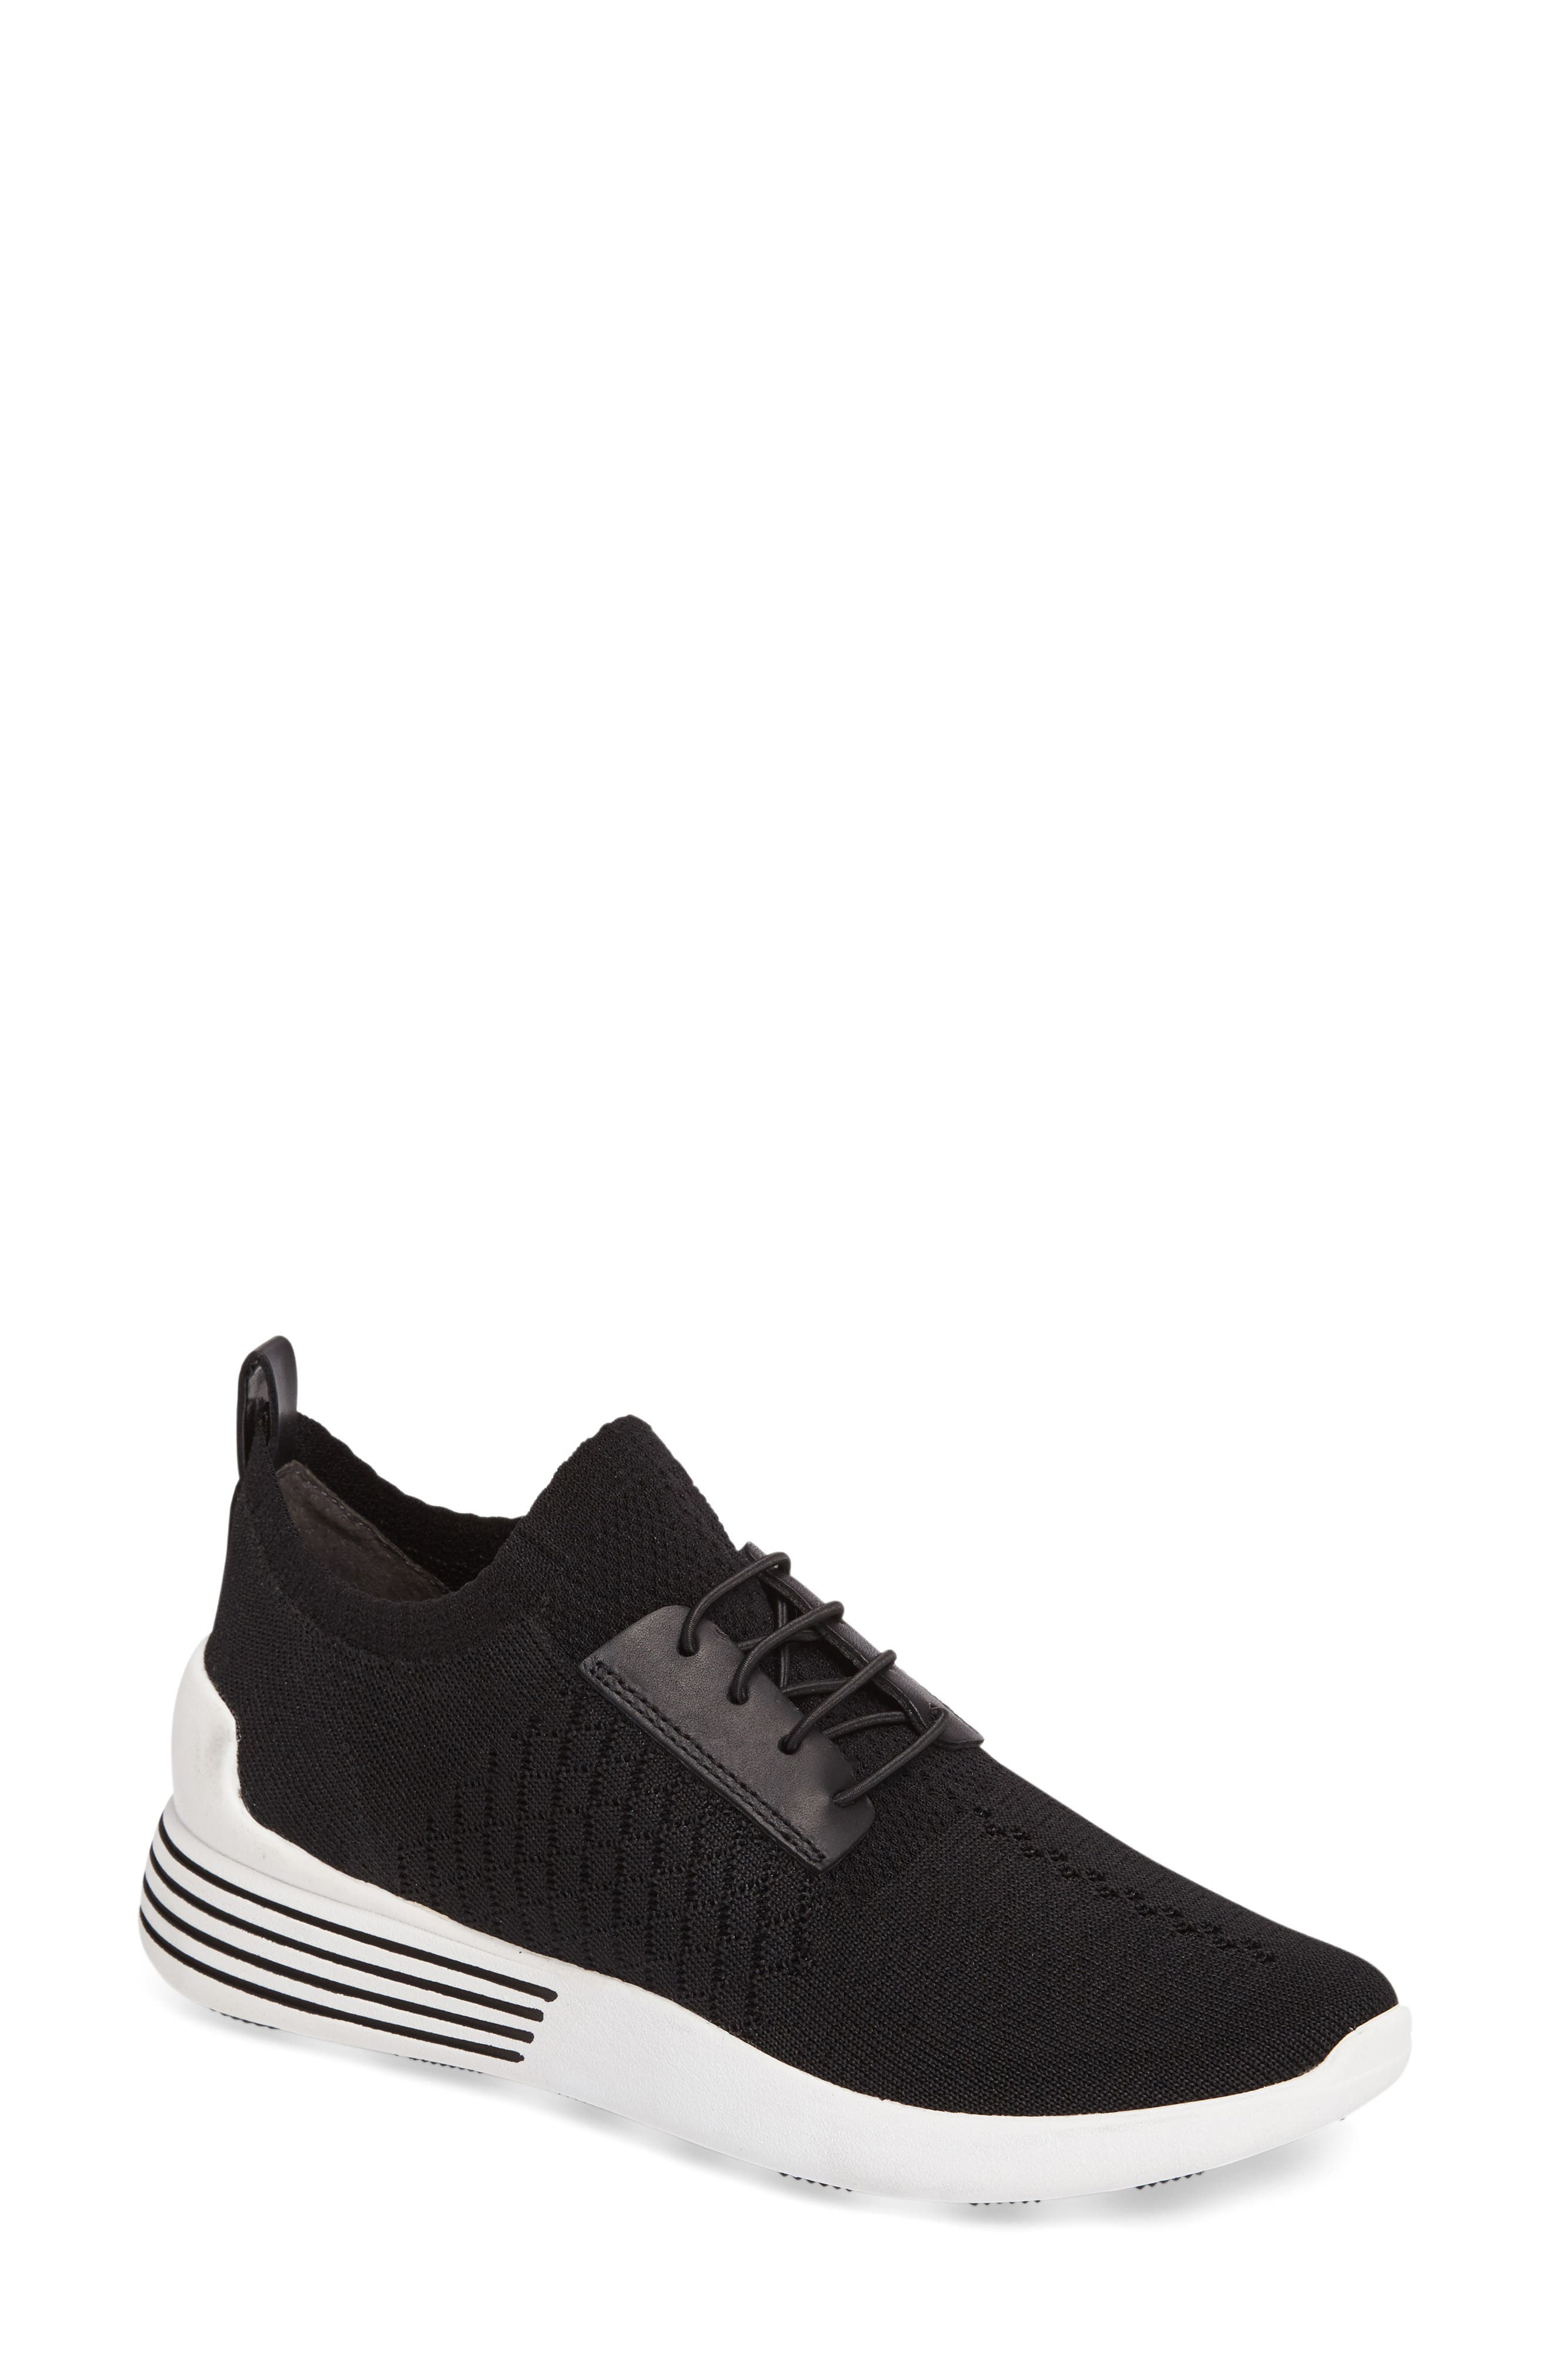 Brandy Woven Sneaker,                             Main thumbnail 1, color,                             Black/ Black Fabric